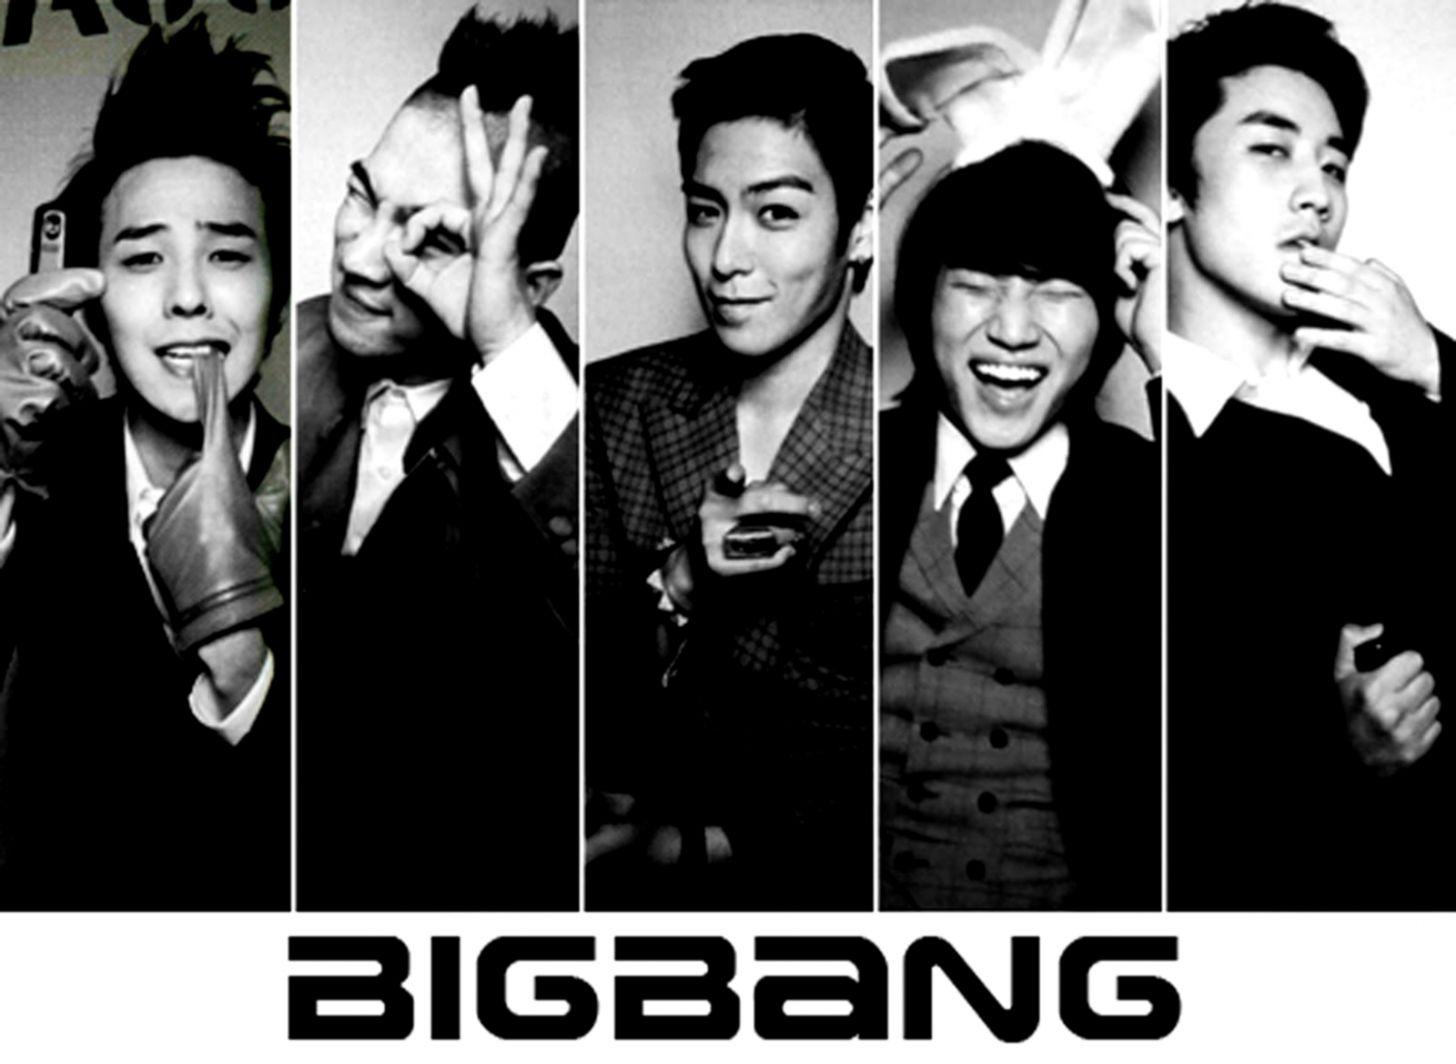 Bigbang K Pop Hd Wallpaper Wallpapers Collection